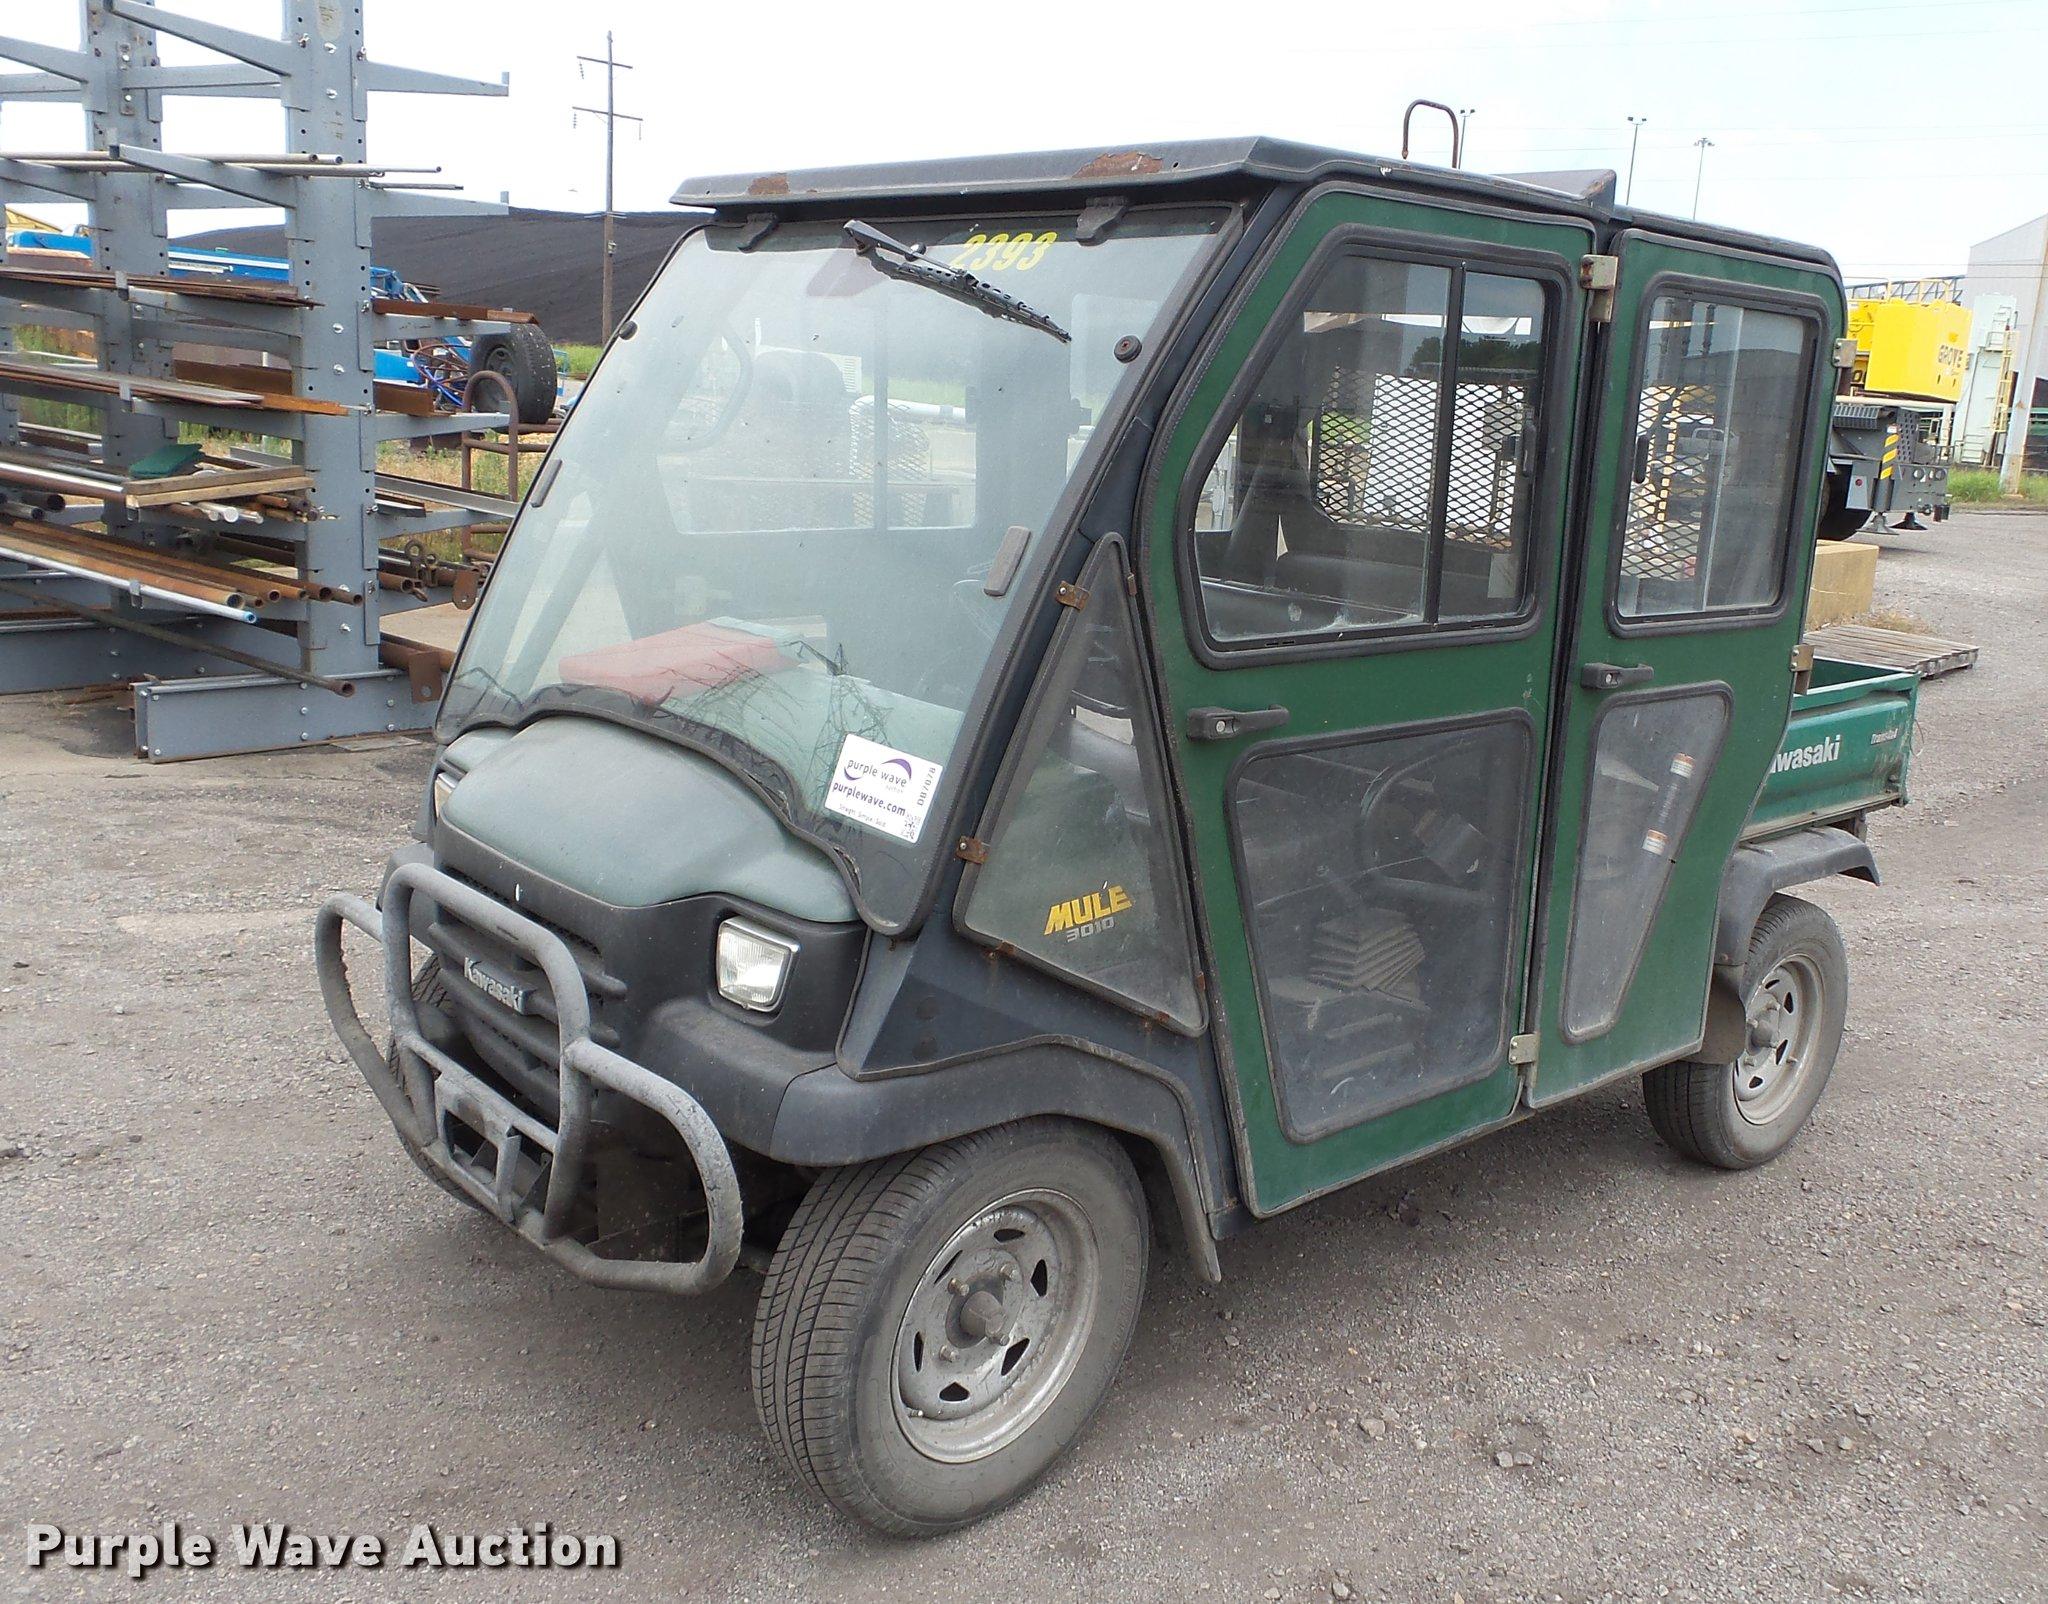 2008 Kawasaki Mule 3010 Utility Vehicle Item Db7078 Sold Fuel Filter Full Size In New Window